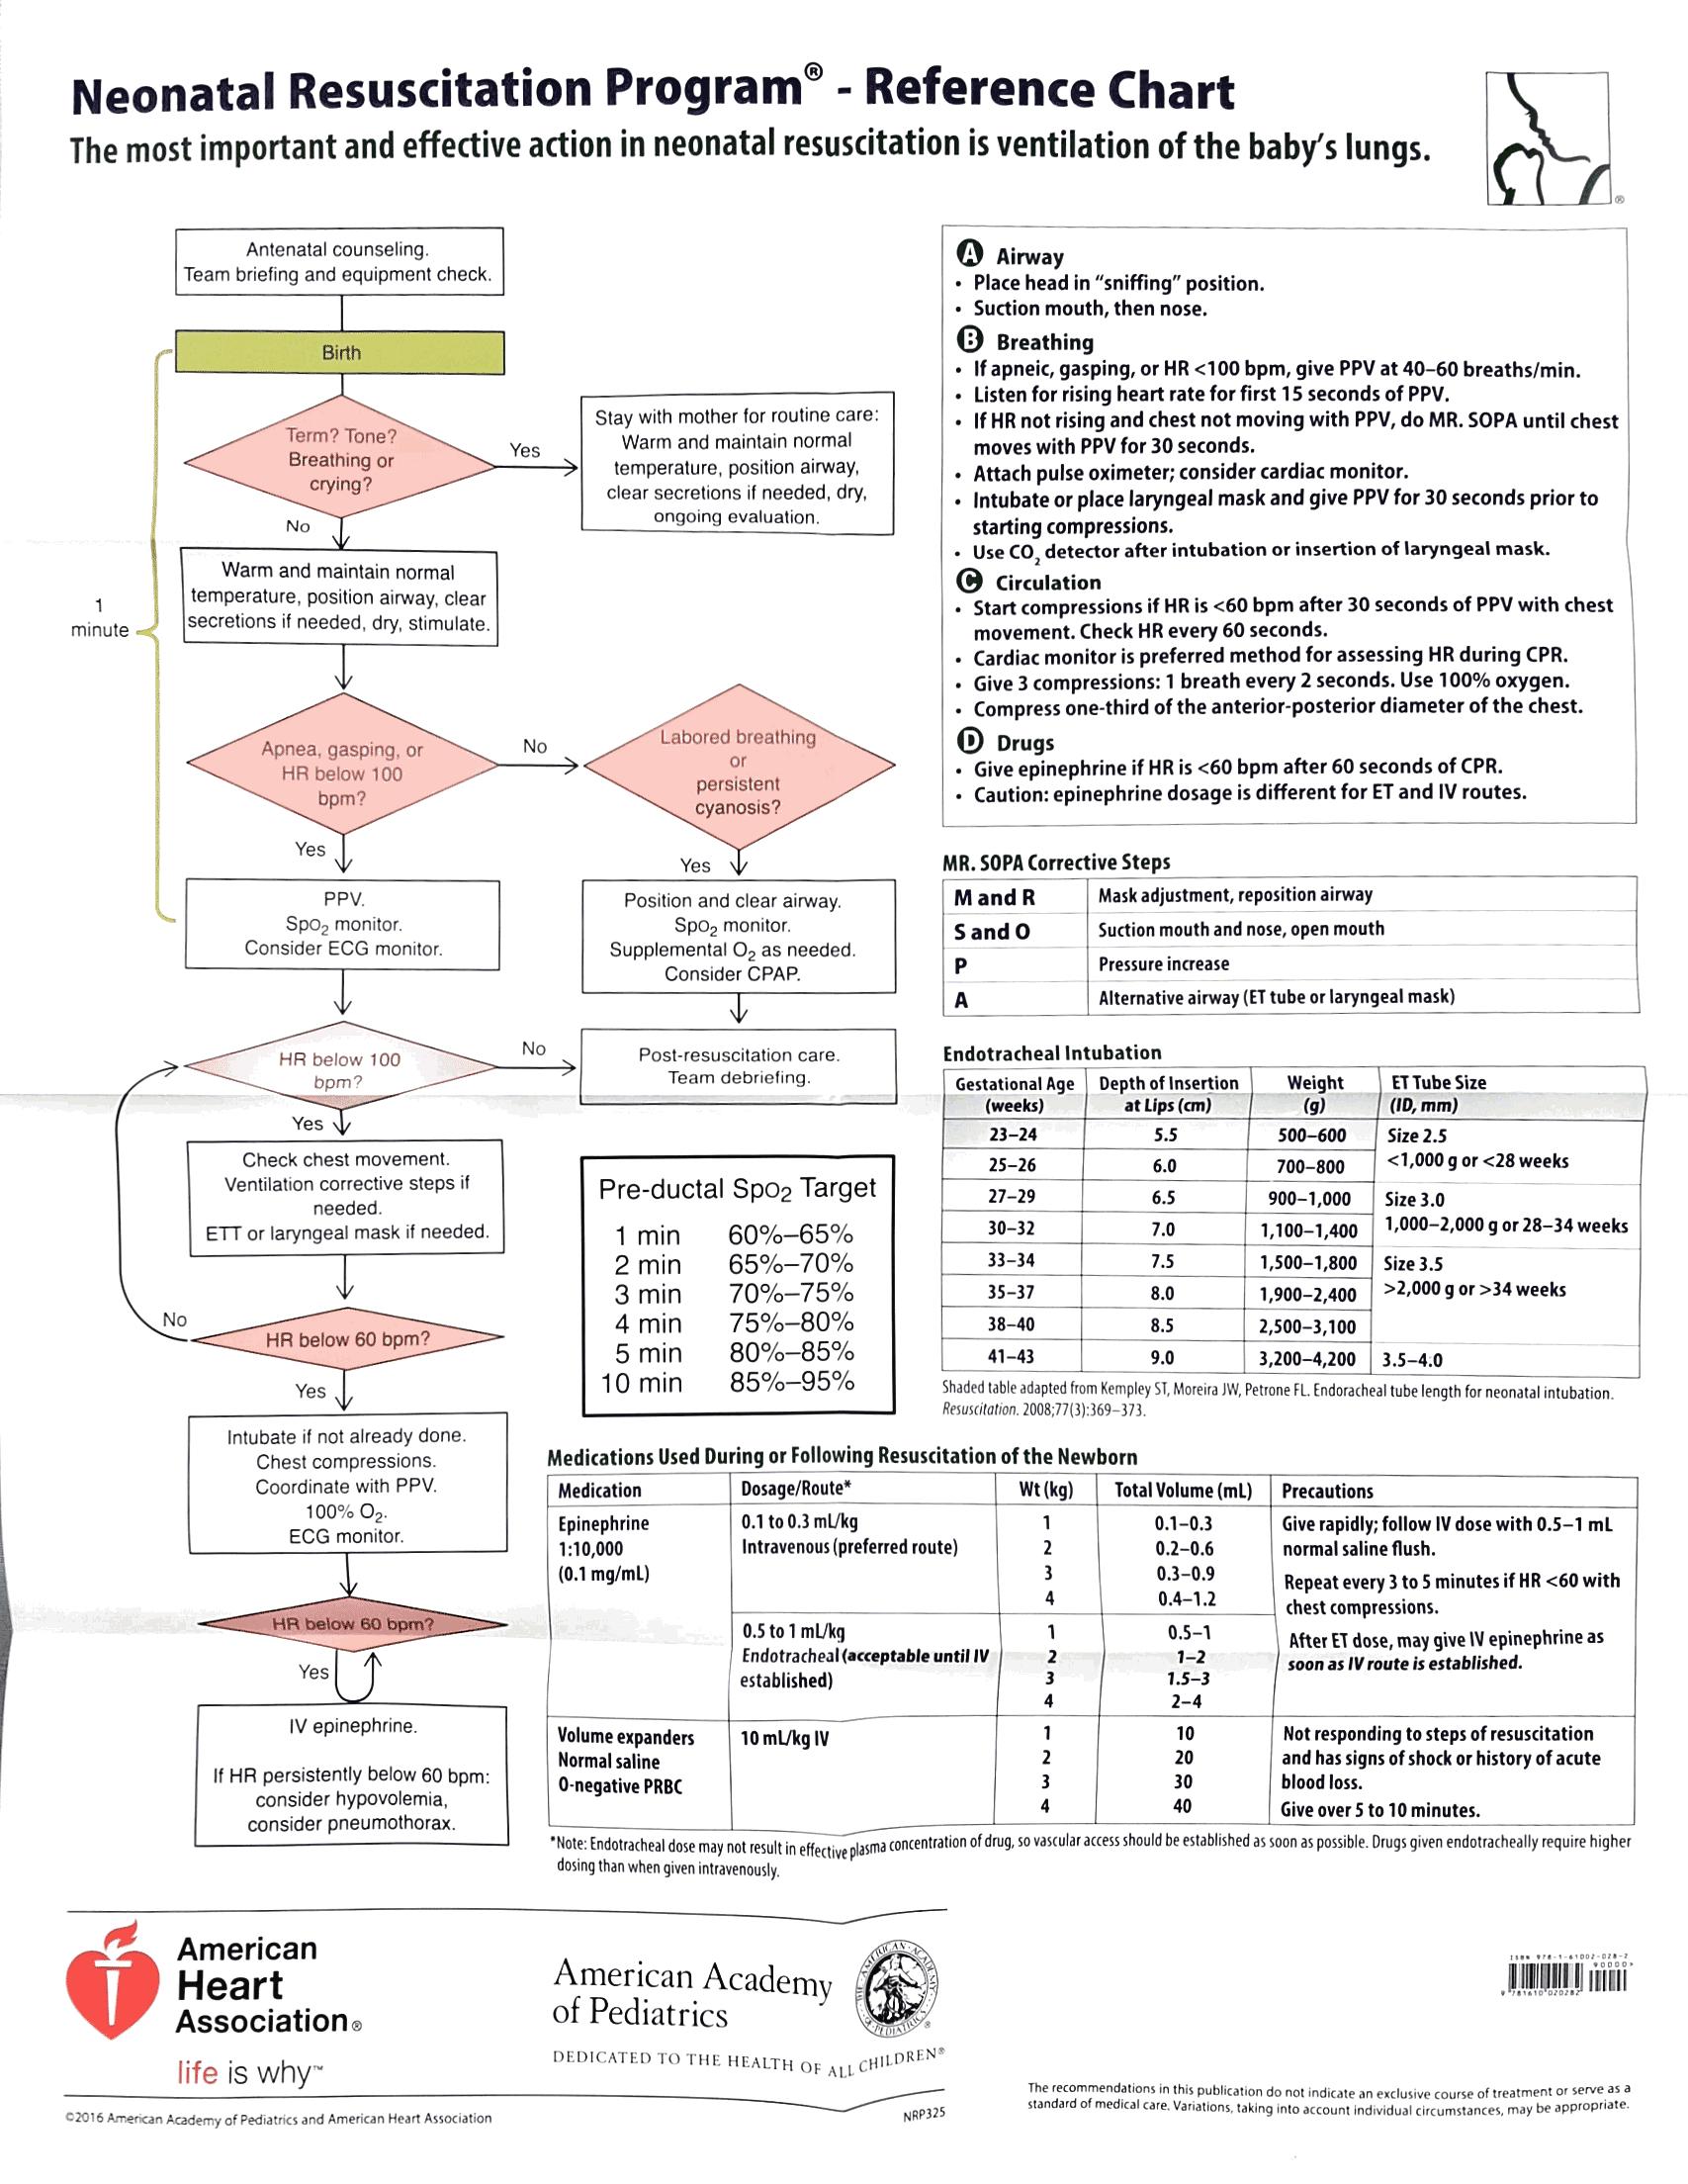 NALS - Neonatal Resuscitation Algorithm (NALS) | MedTx